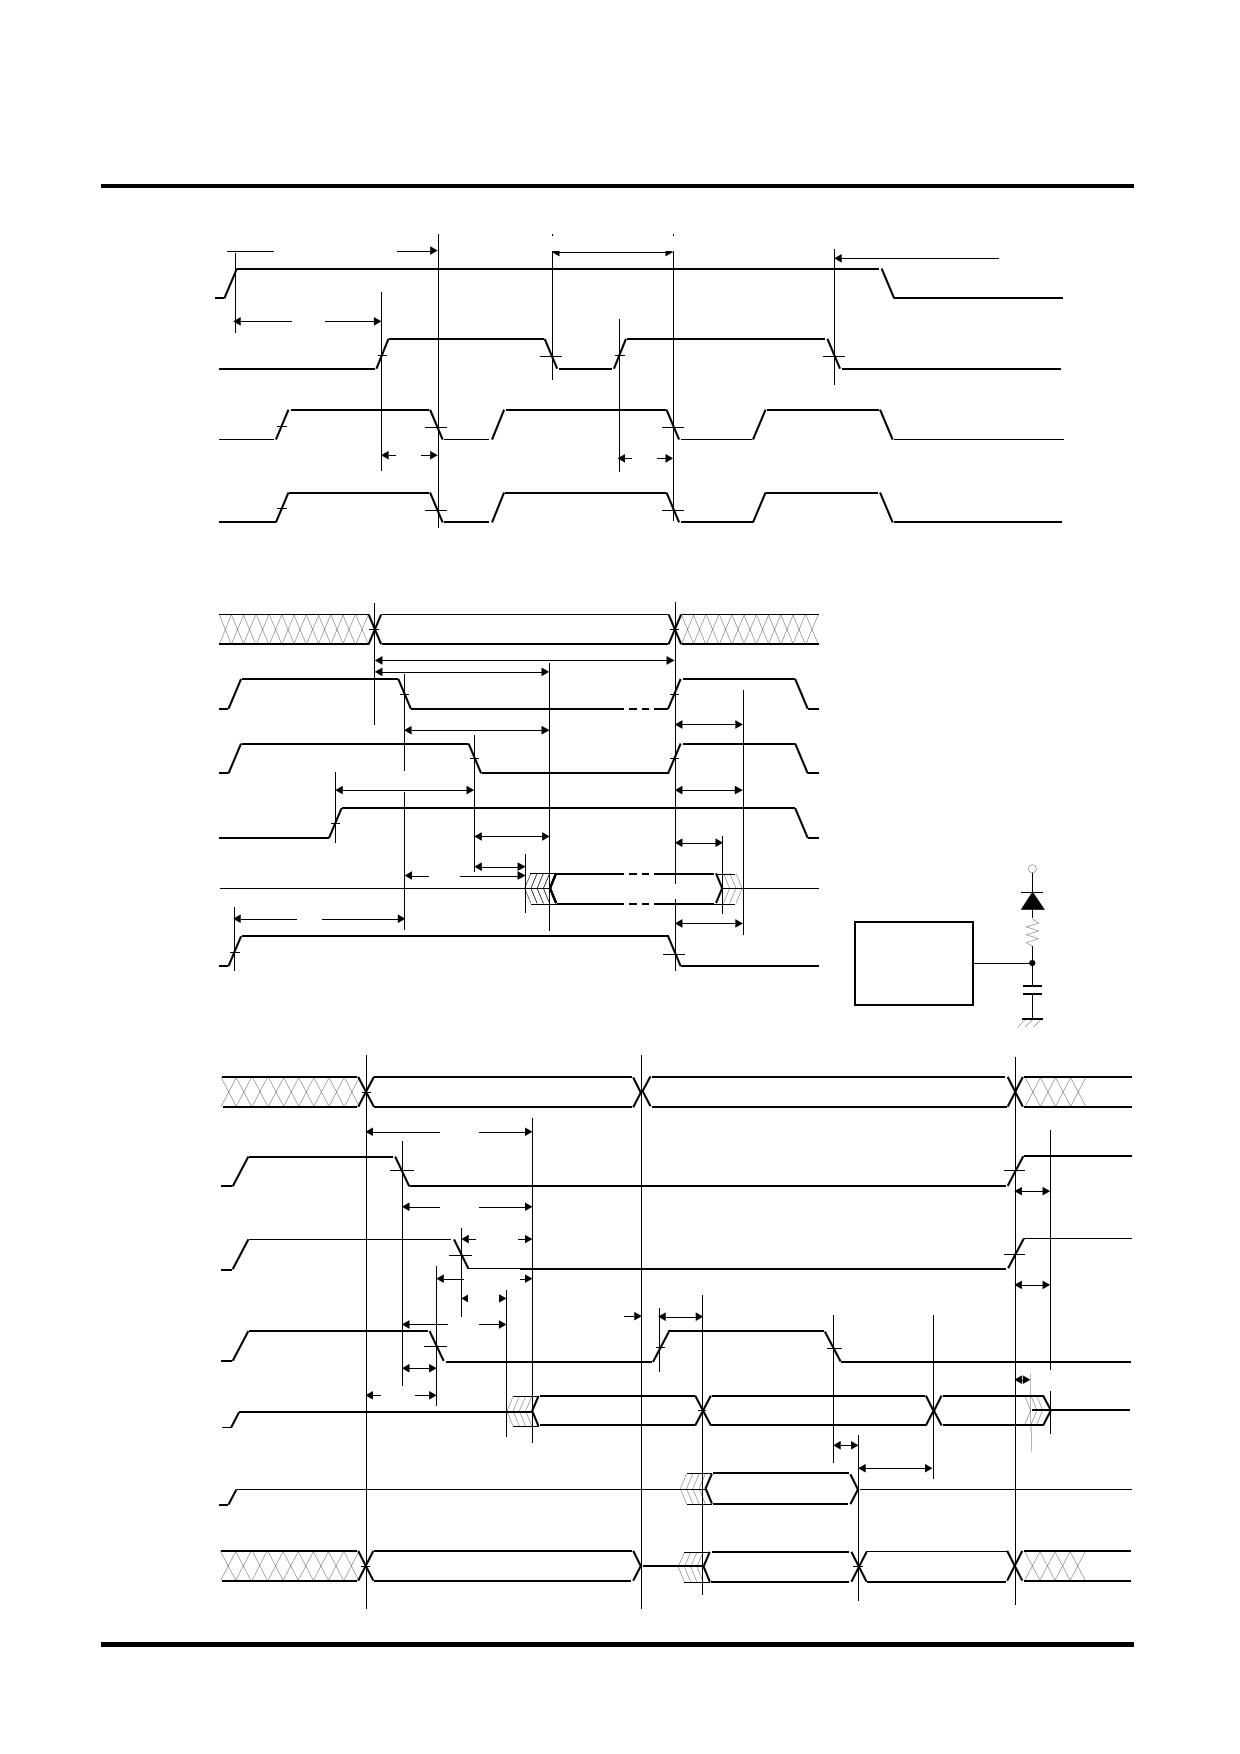 M5M29FB800RV-12 transistor, diode fet, igbt, scr